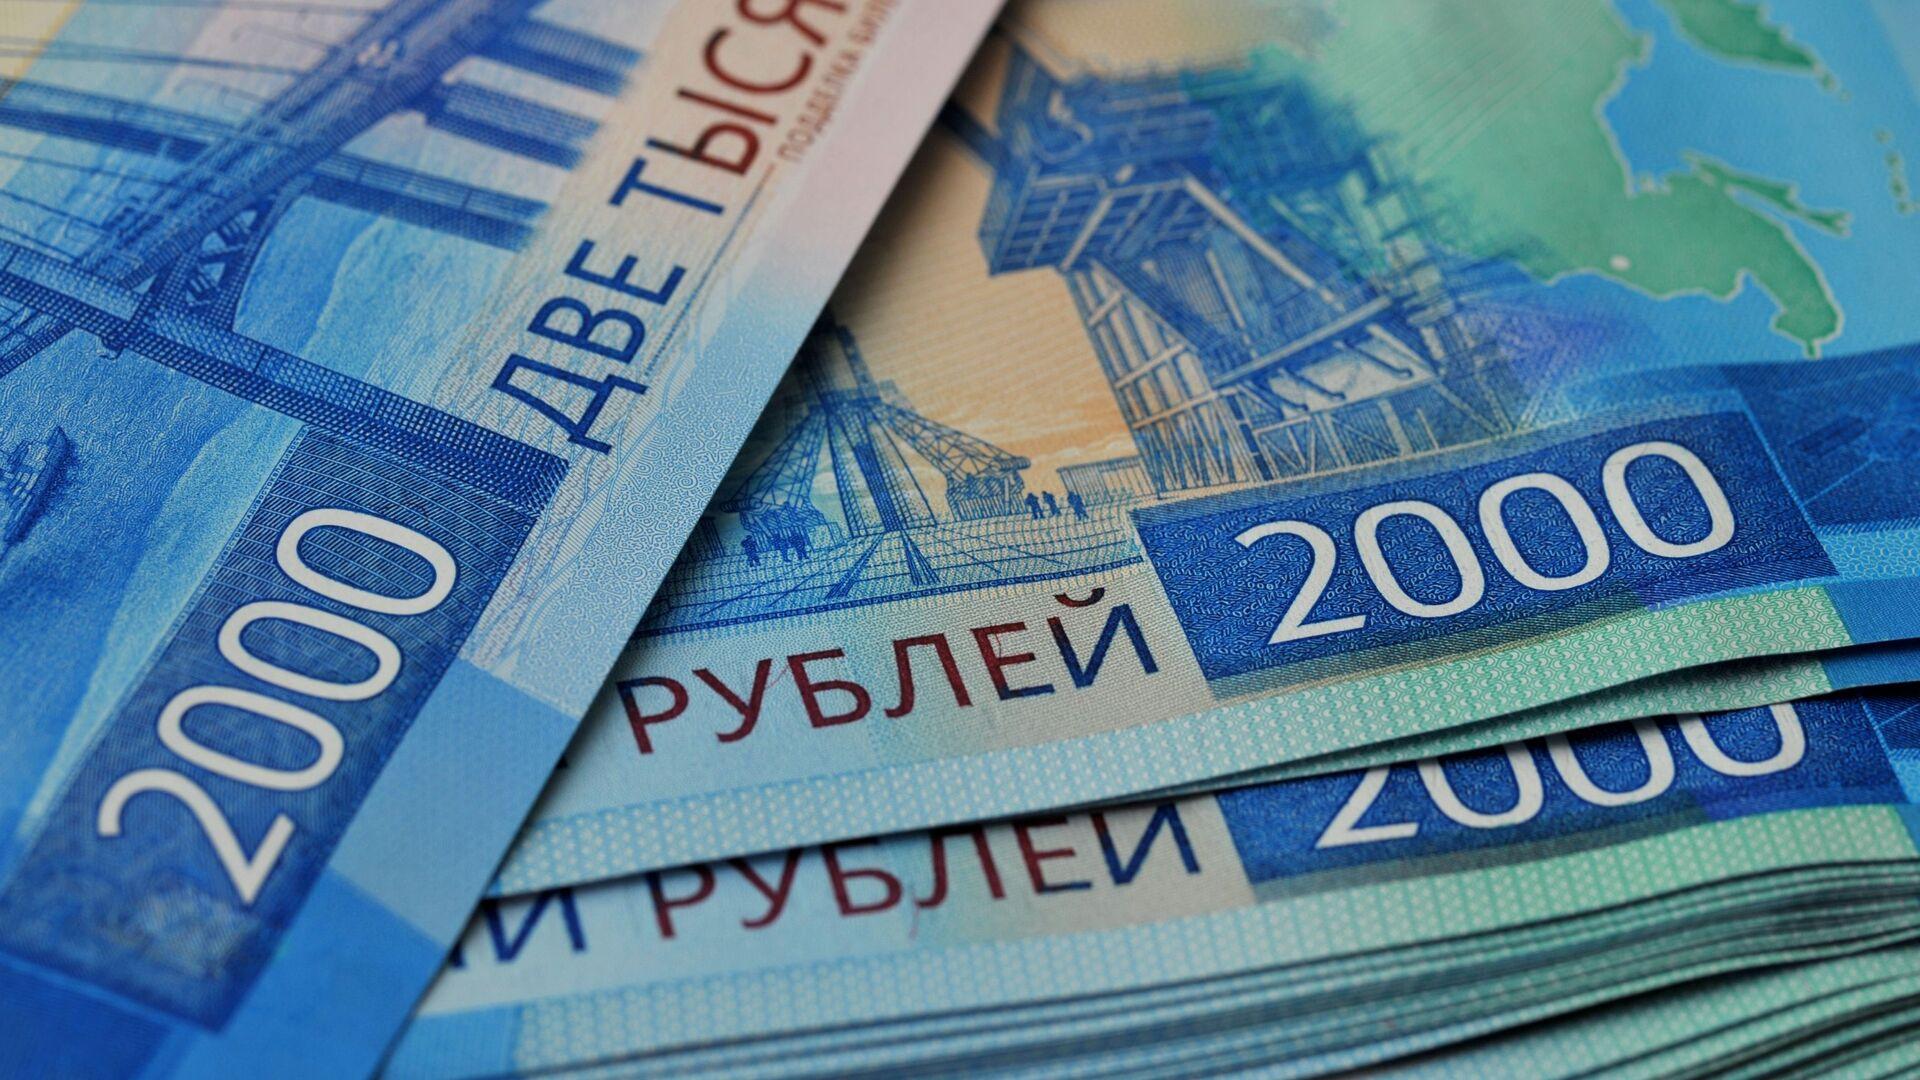 Банкноты номиналом 2000 рублей. - Sputnik Абхазия, 1920, 27.09.2021